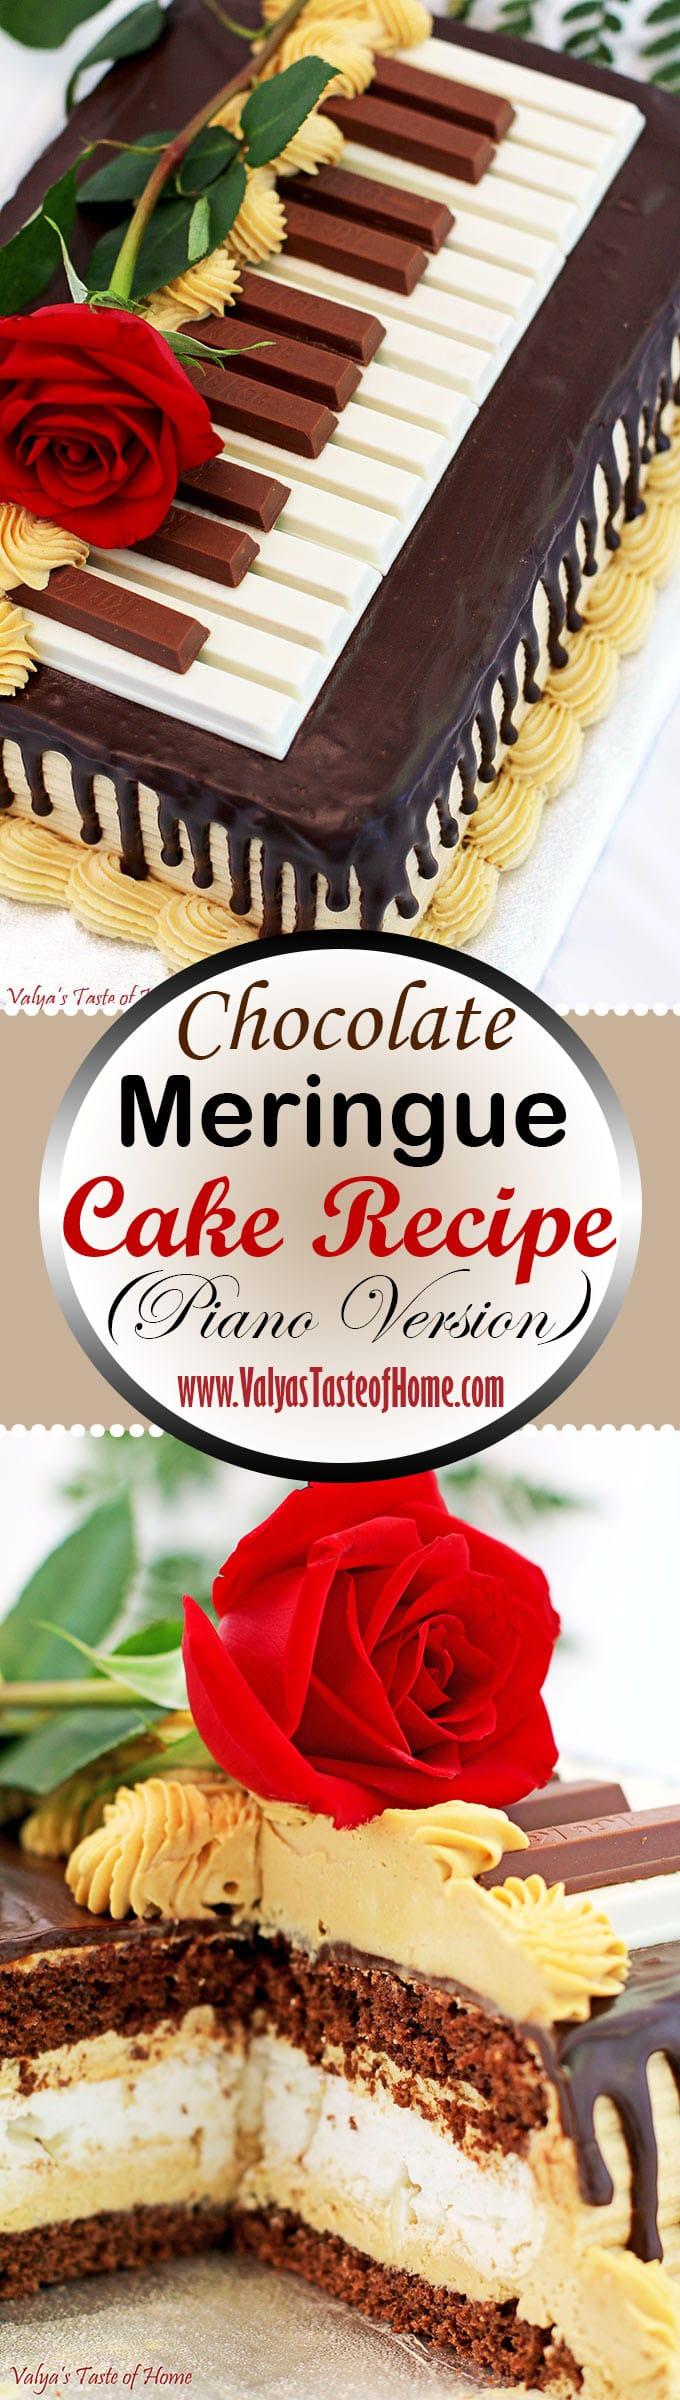 Yogurt Pear Cake Recipe